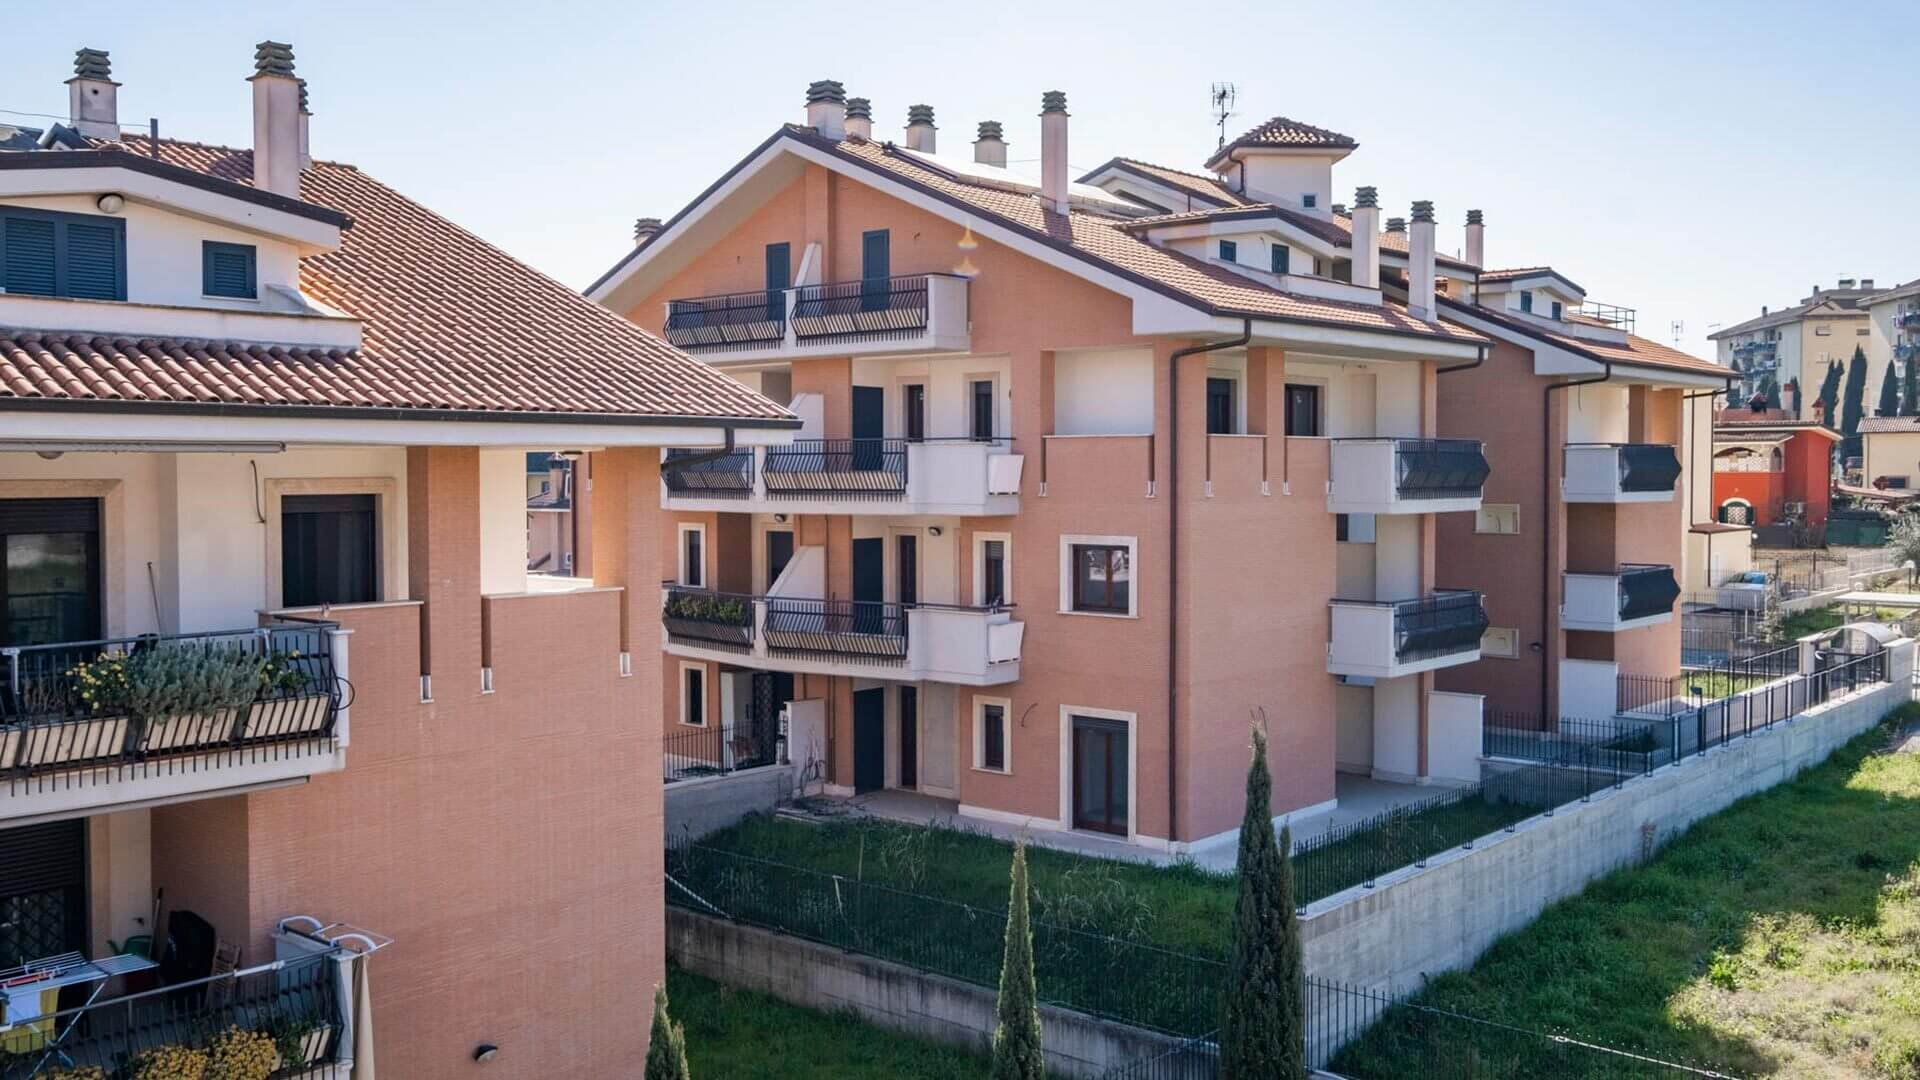 Verdemonte